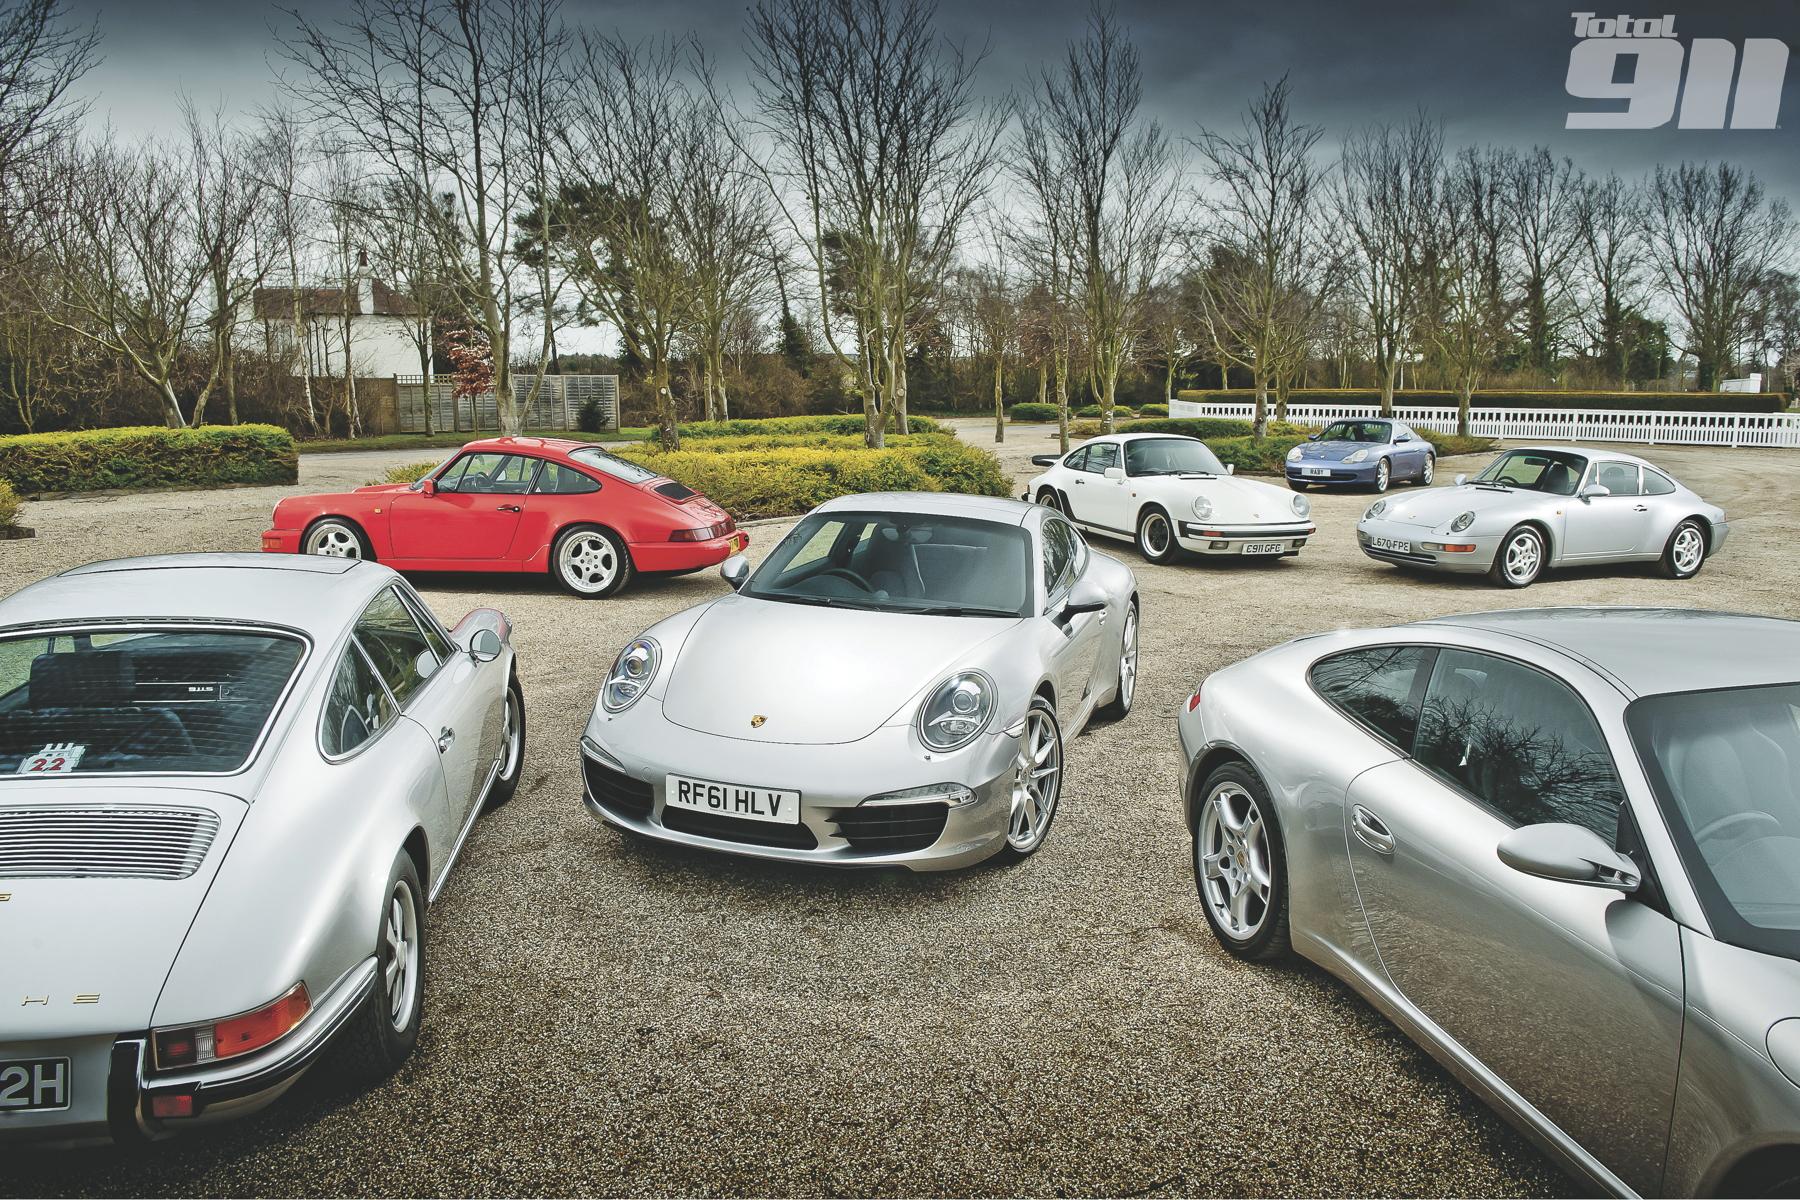 Porsche 911s Total 911